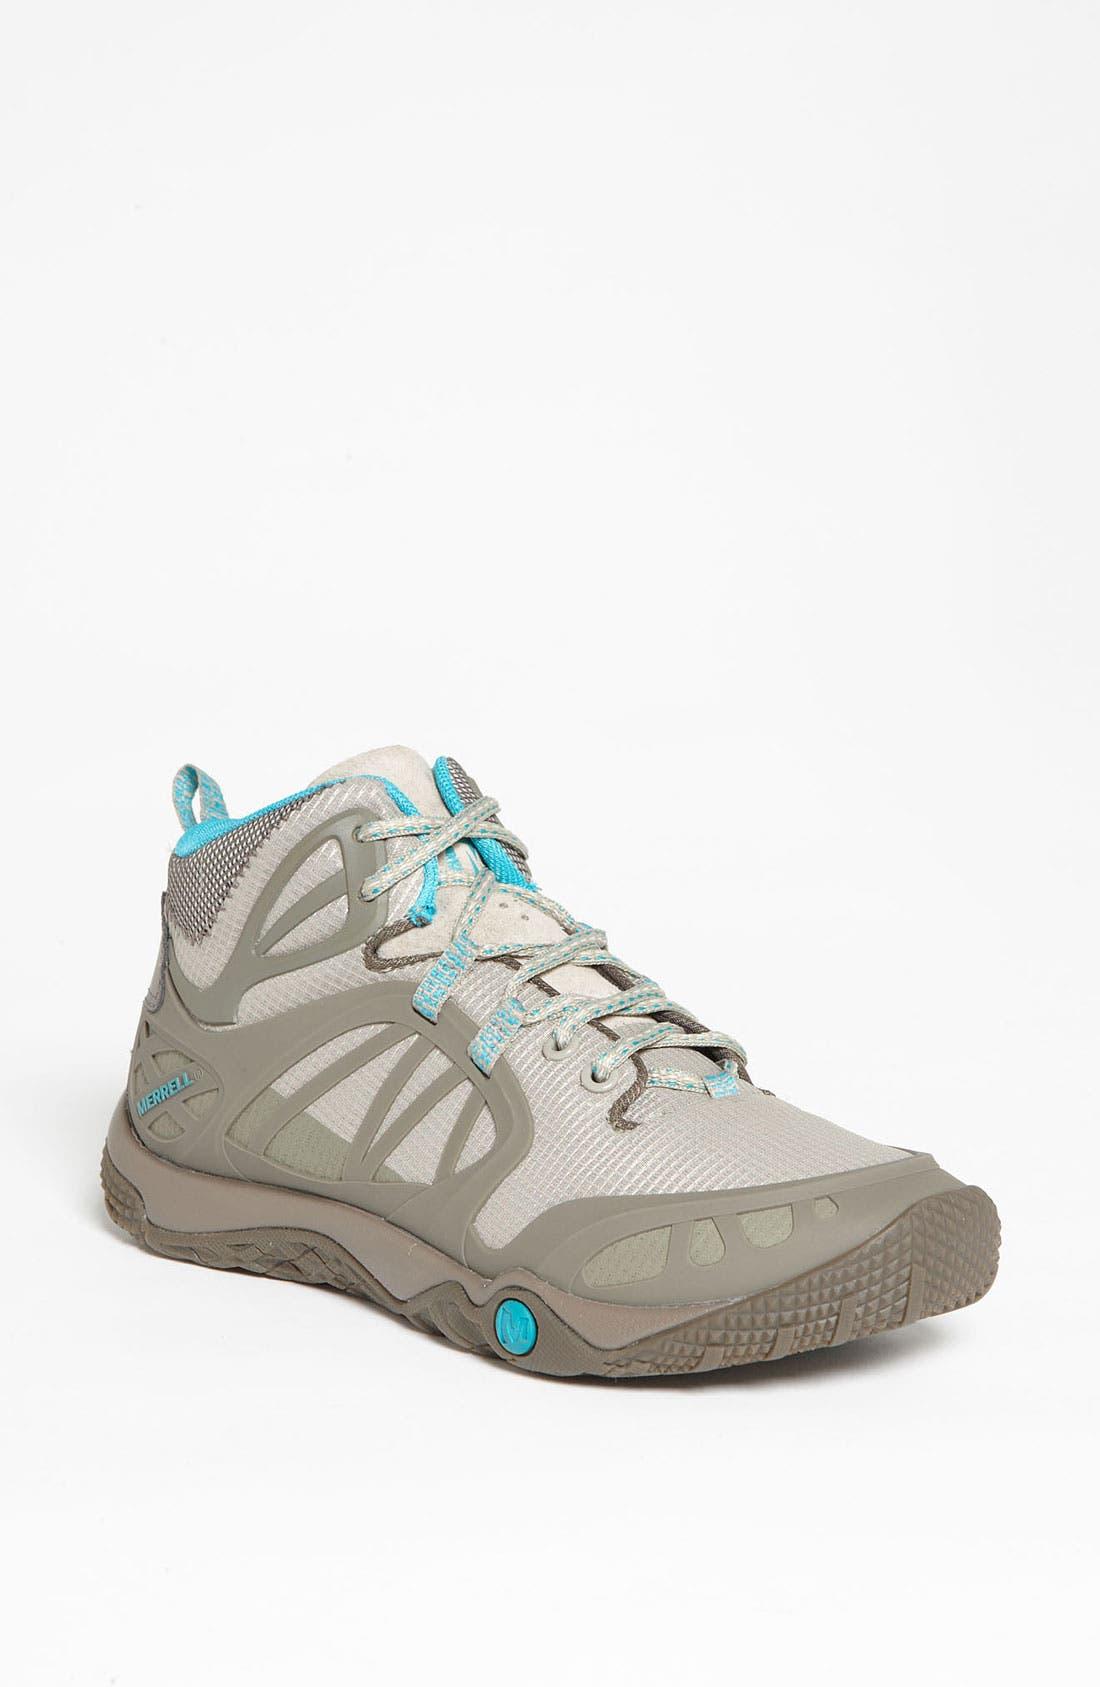 Main Image - Merrell 'Proterra Vim Mid' Walking Shoe (Women)